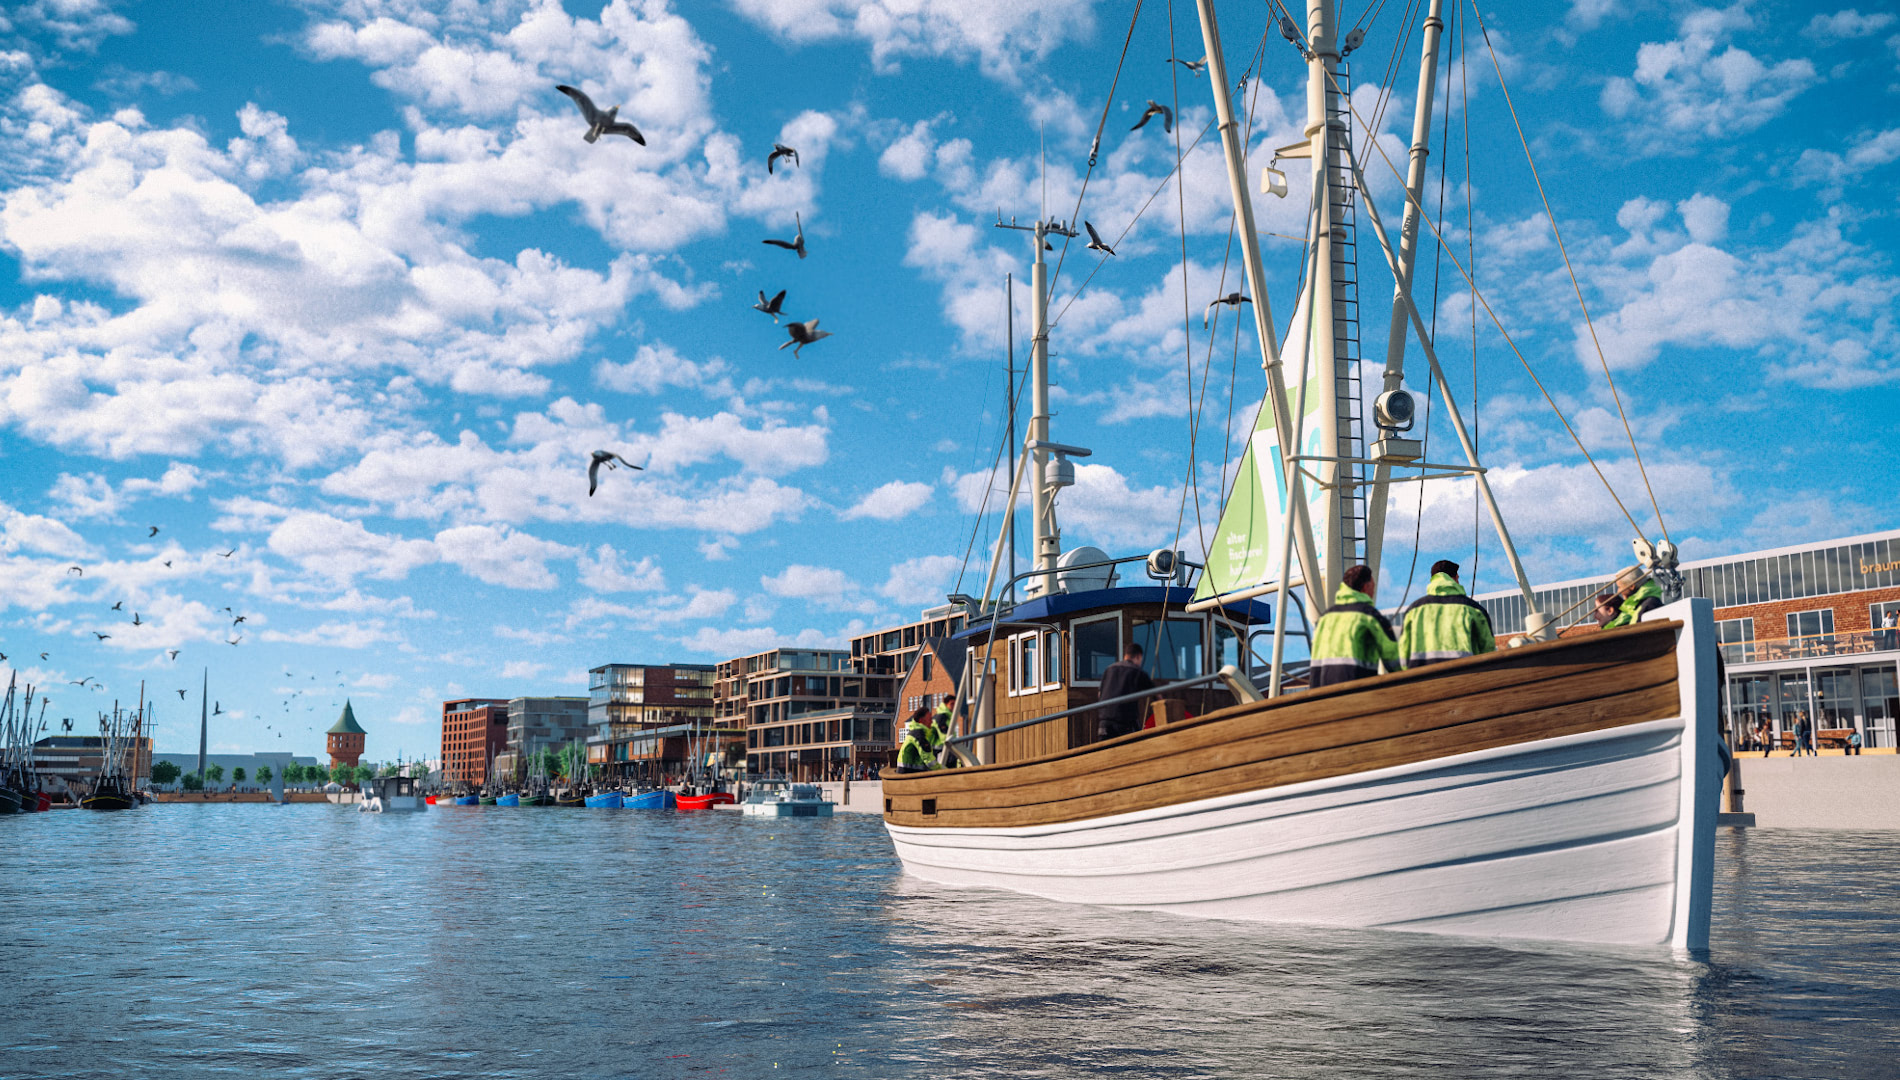 Markenentwicklung Corporate Design Alter Fischereihafen Cuxhaven Ausblick Kai Boot Going Places